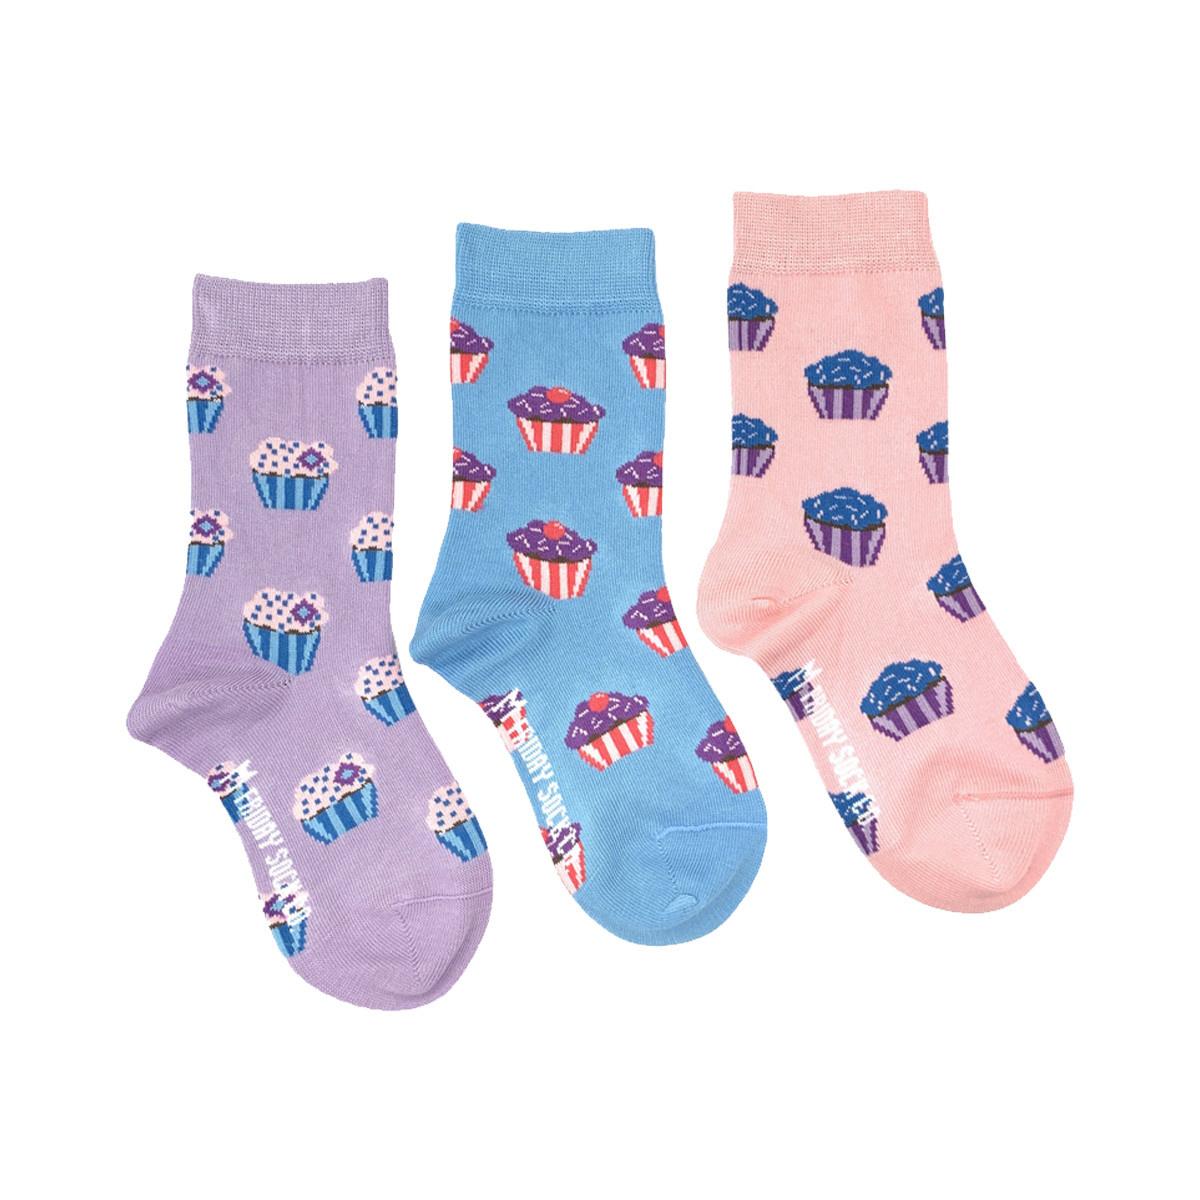 Friday Sock Co. Friday Sock Co. Kids Cupcakes